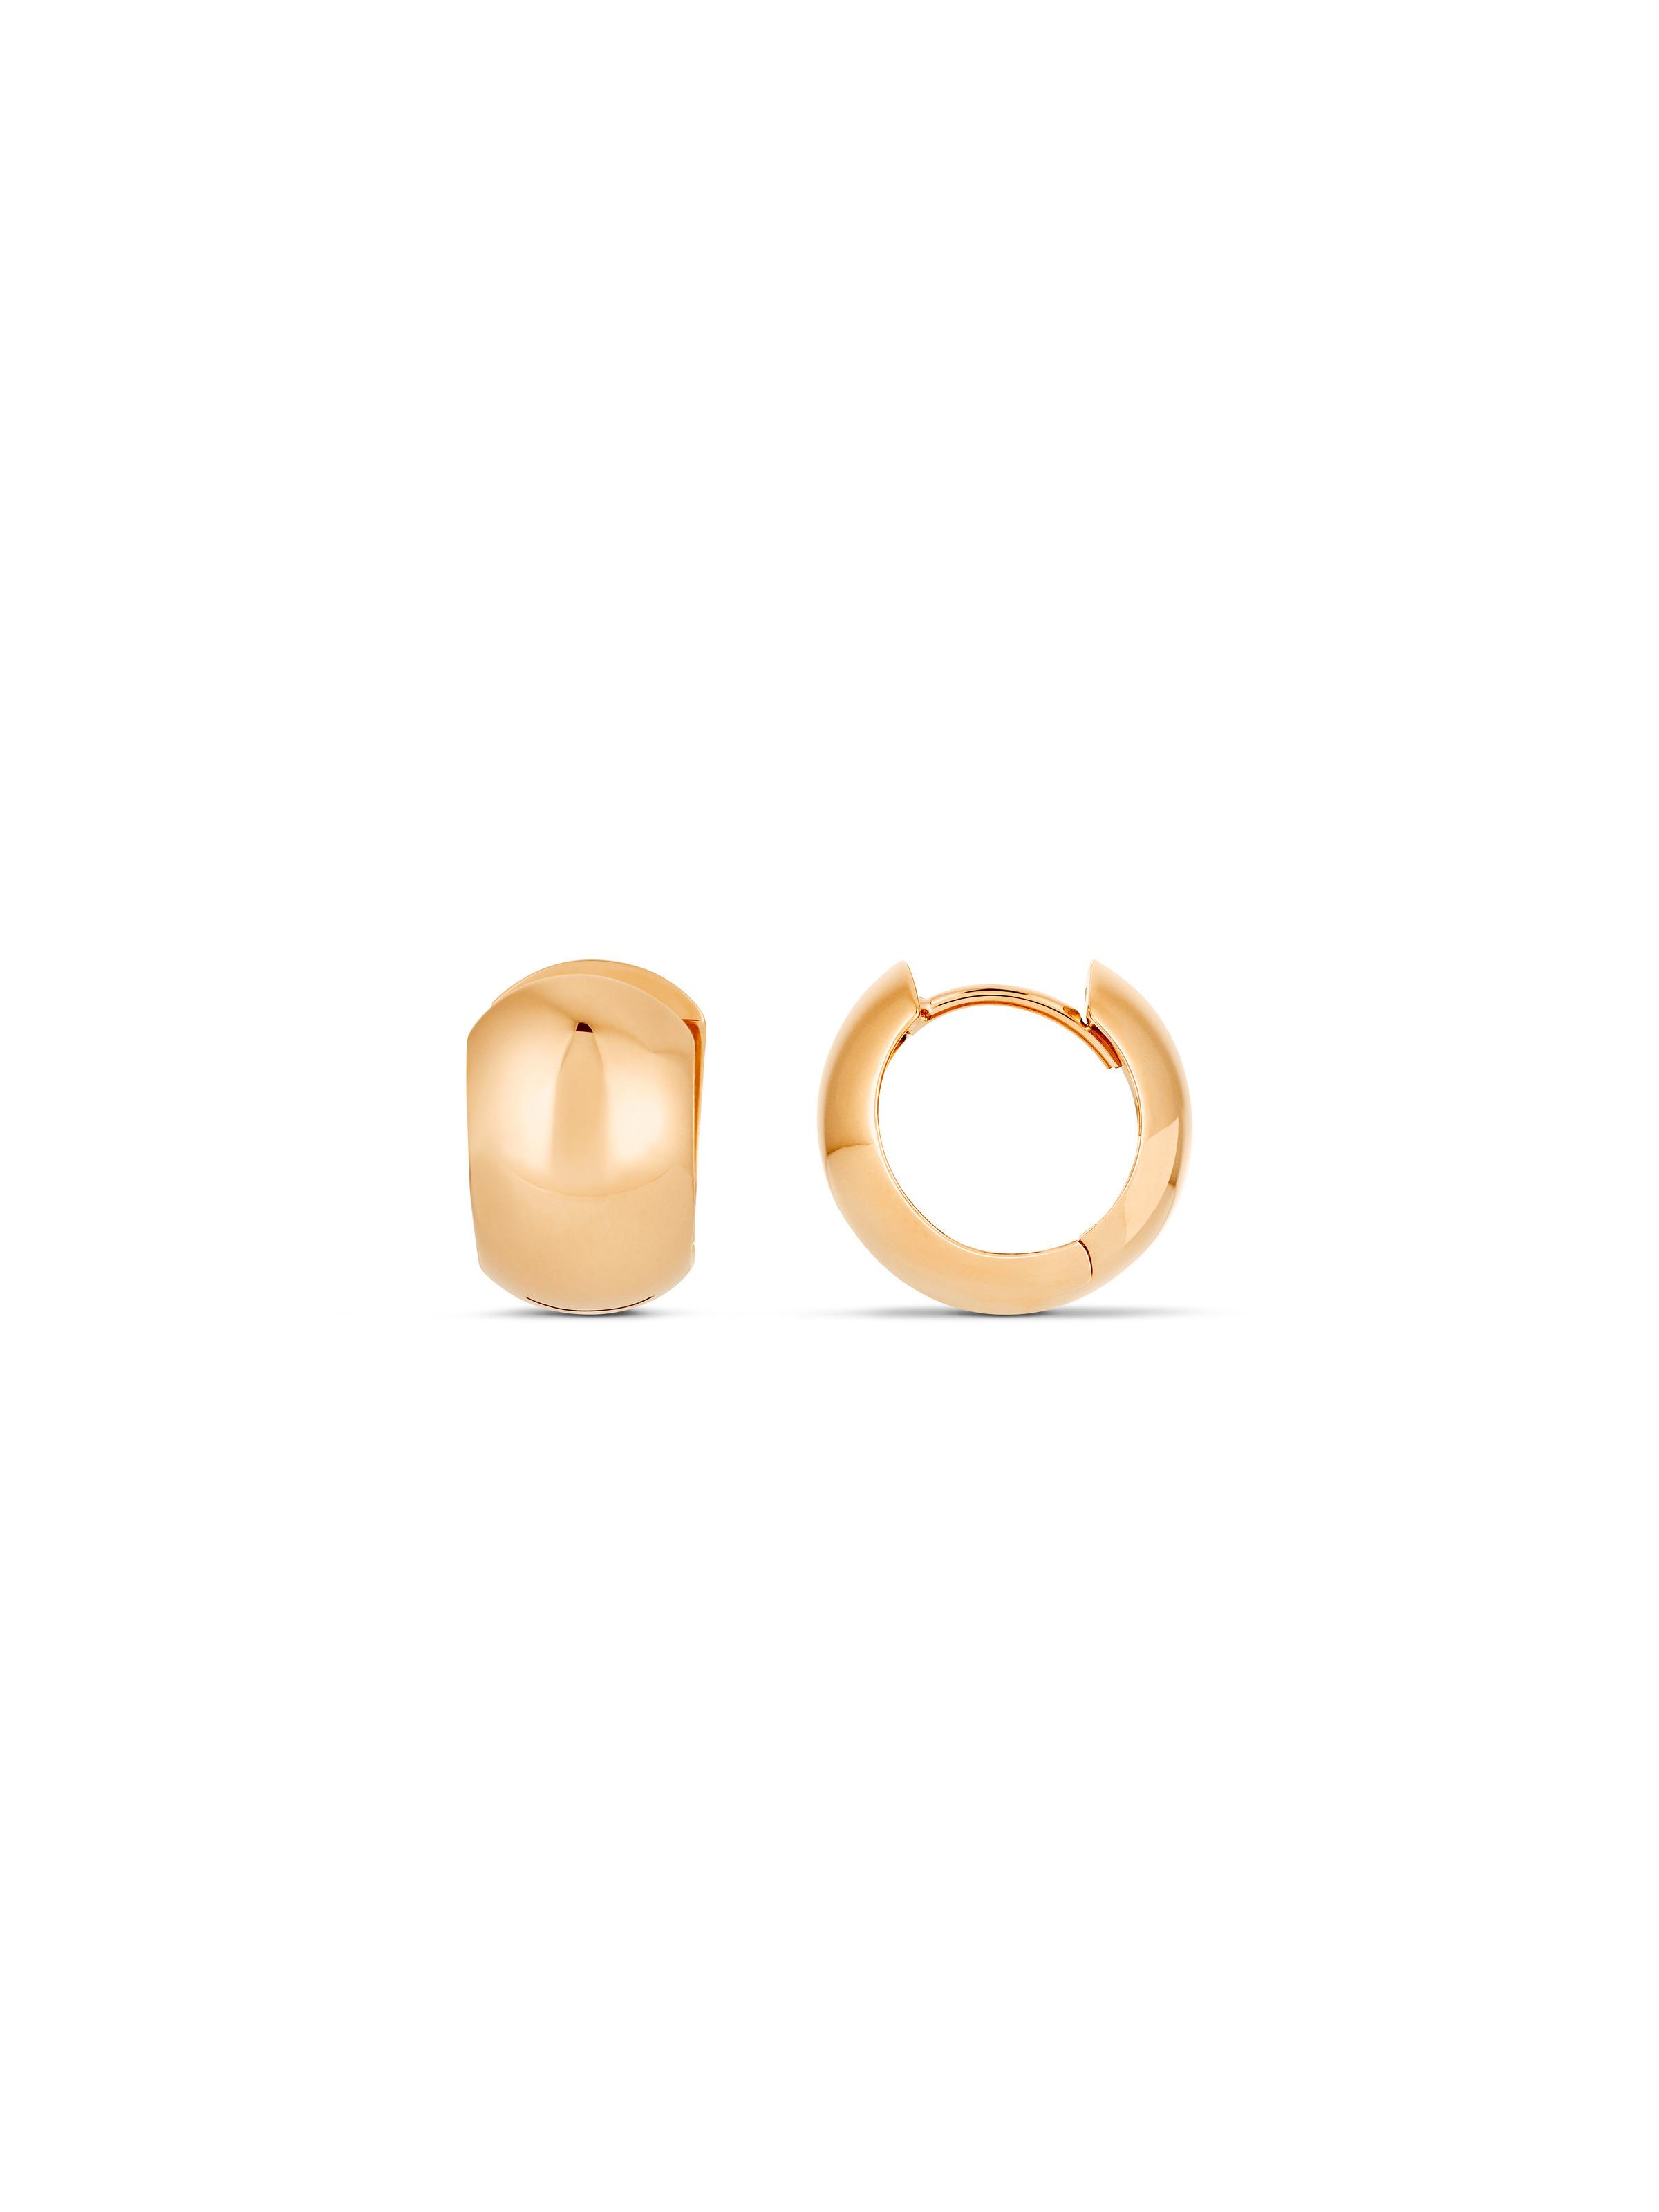 Basics hoop earrings